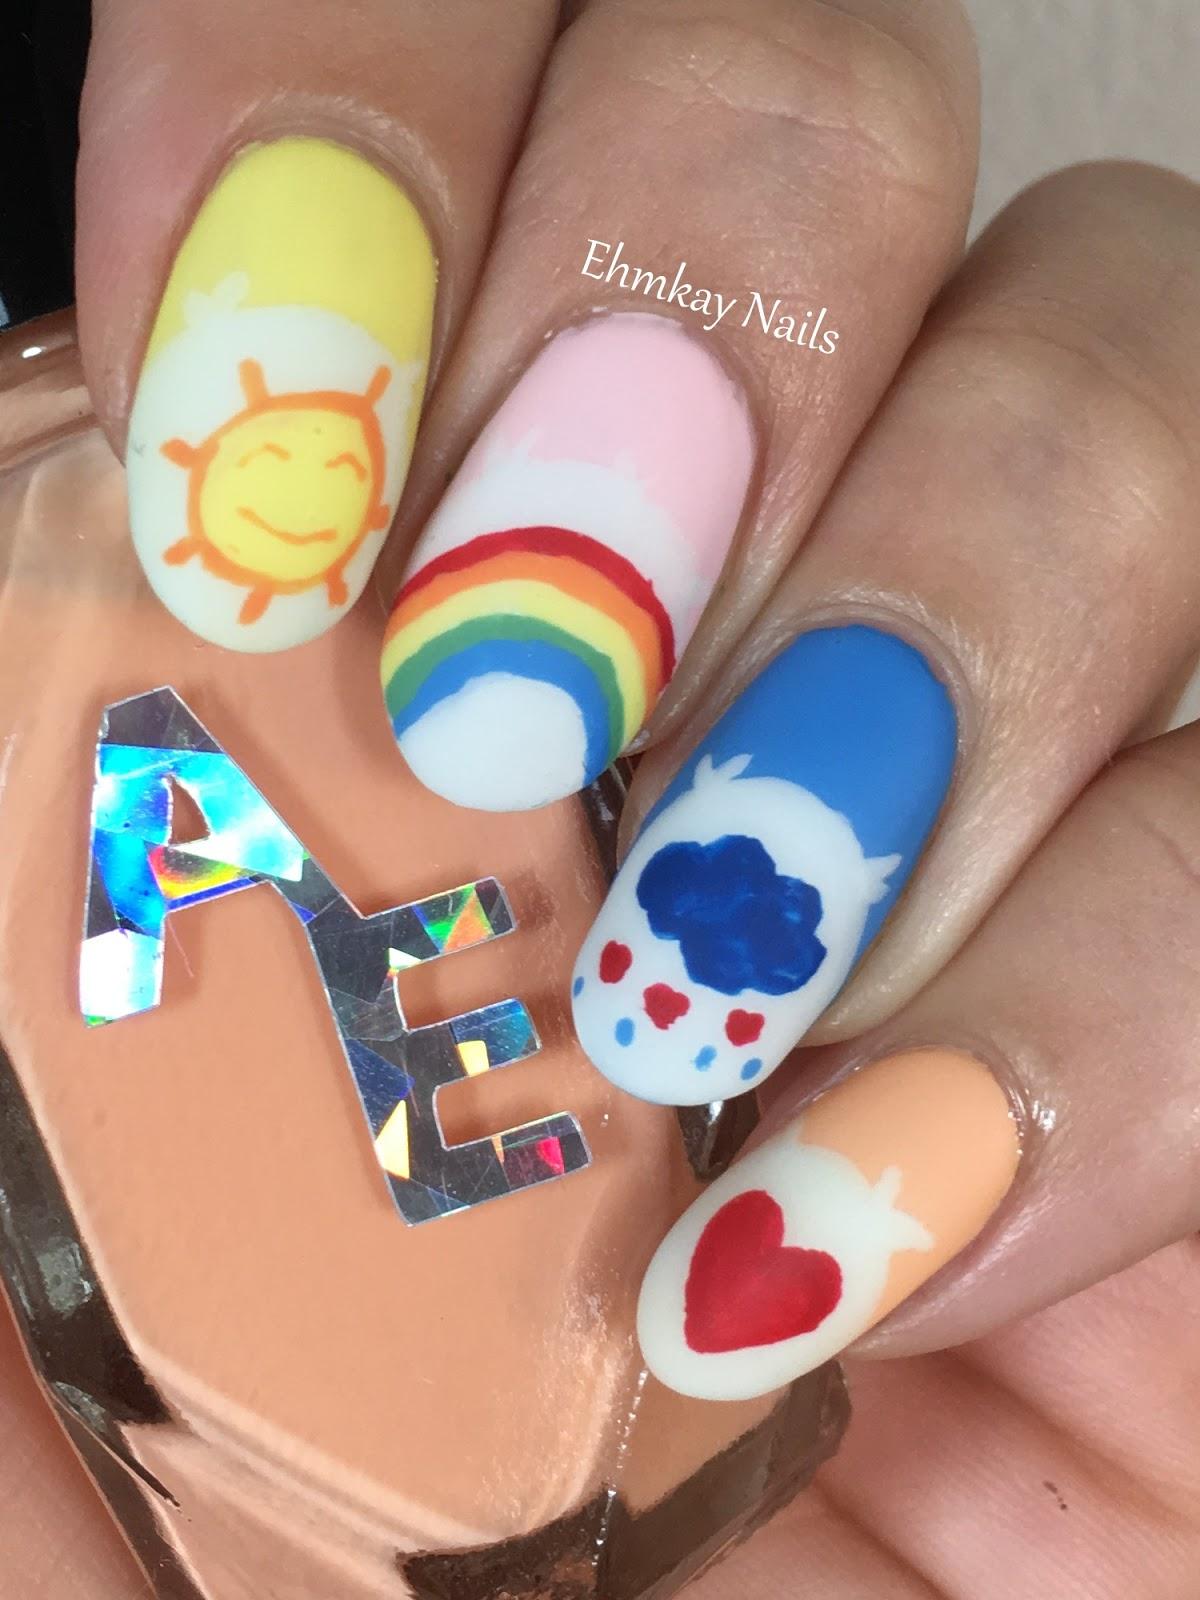 Ehmkay Nails: 80s Nail Art: Care Bears Nail Art